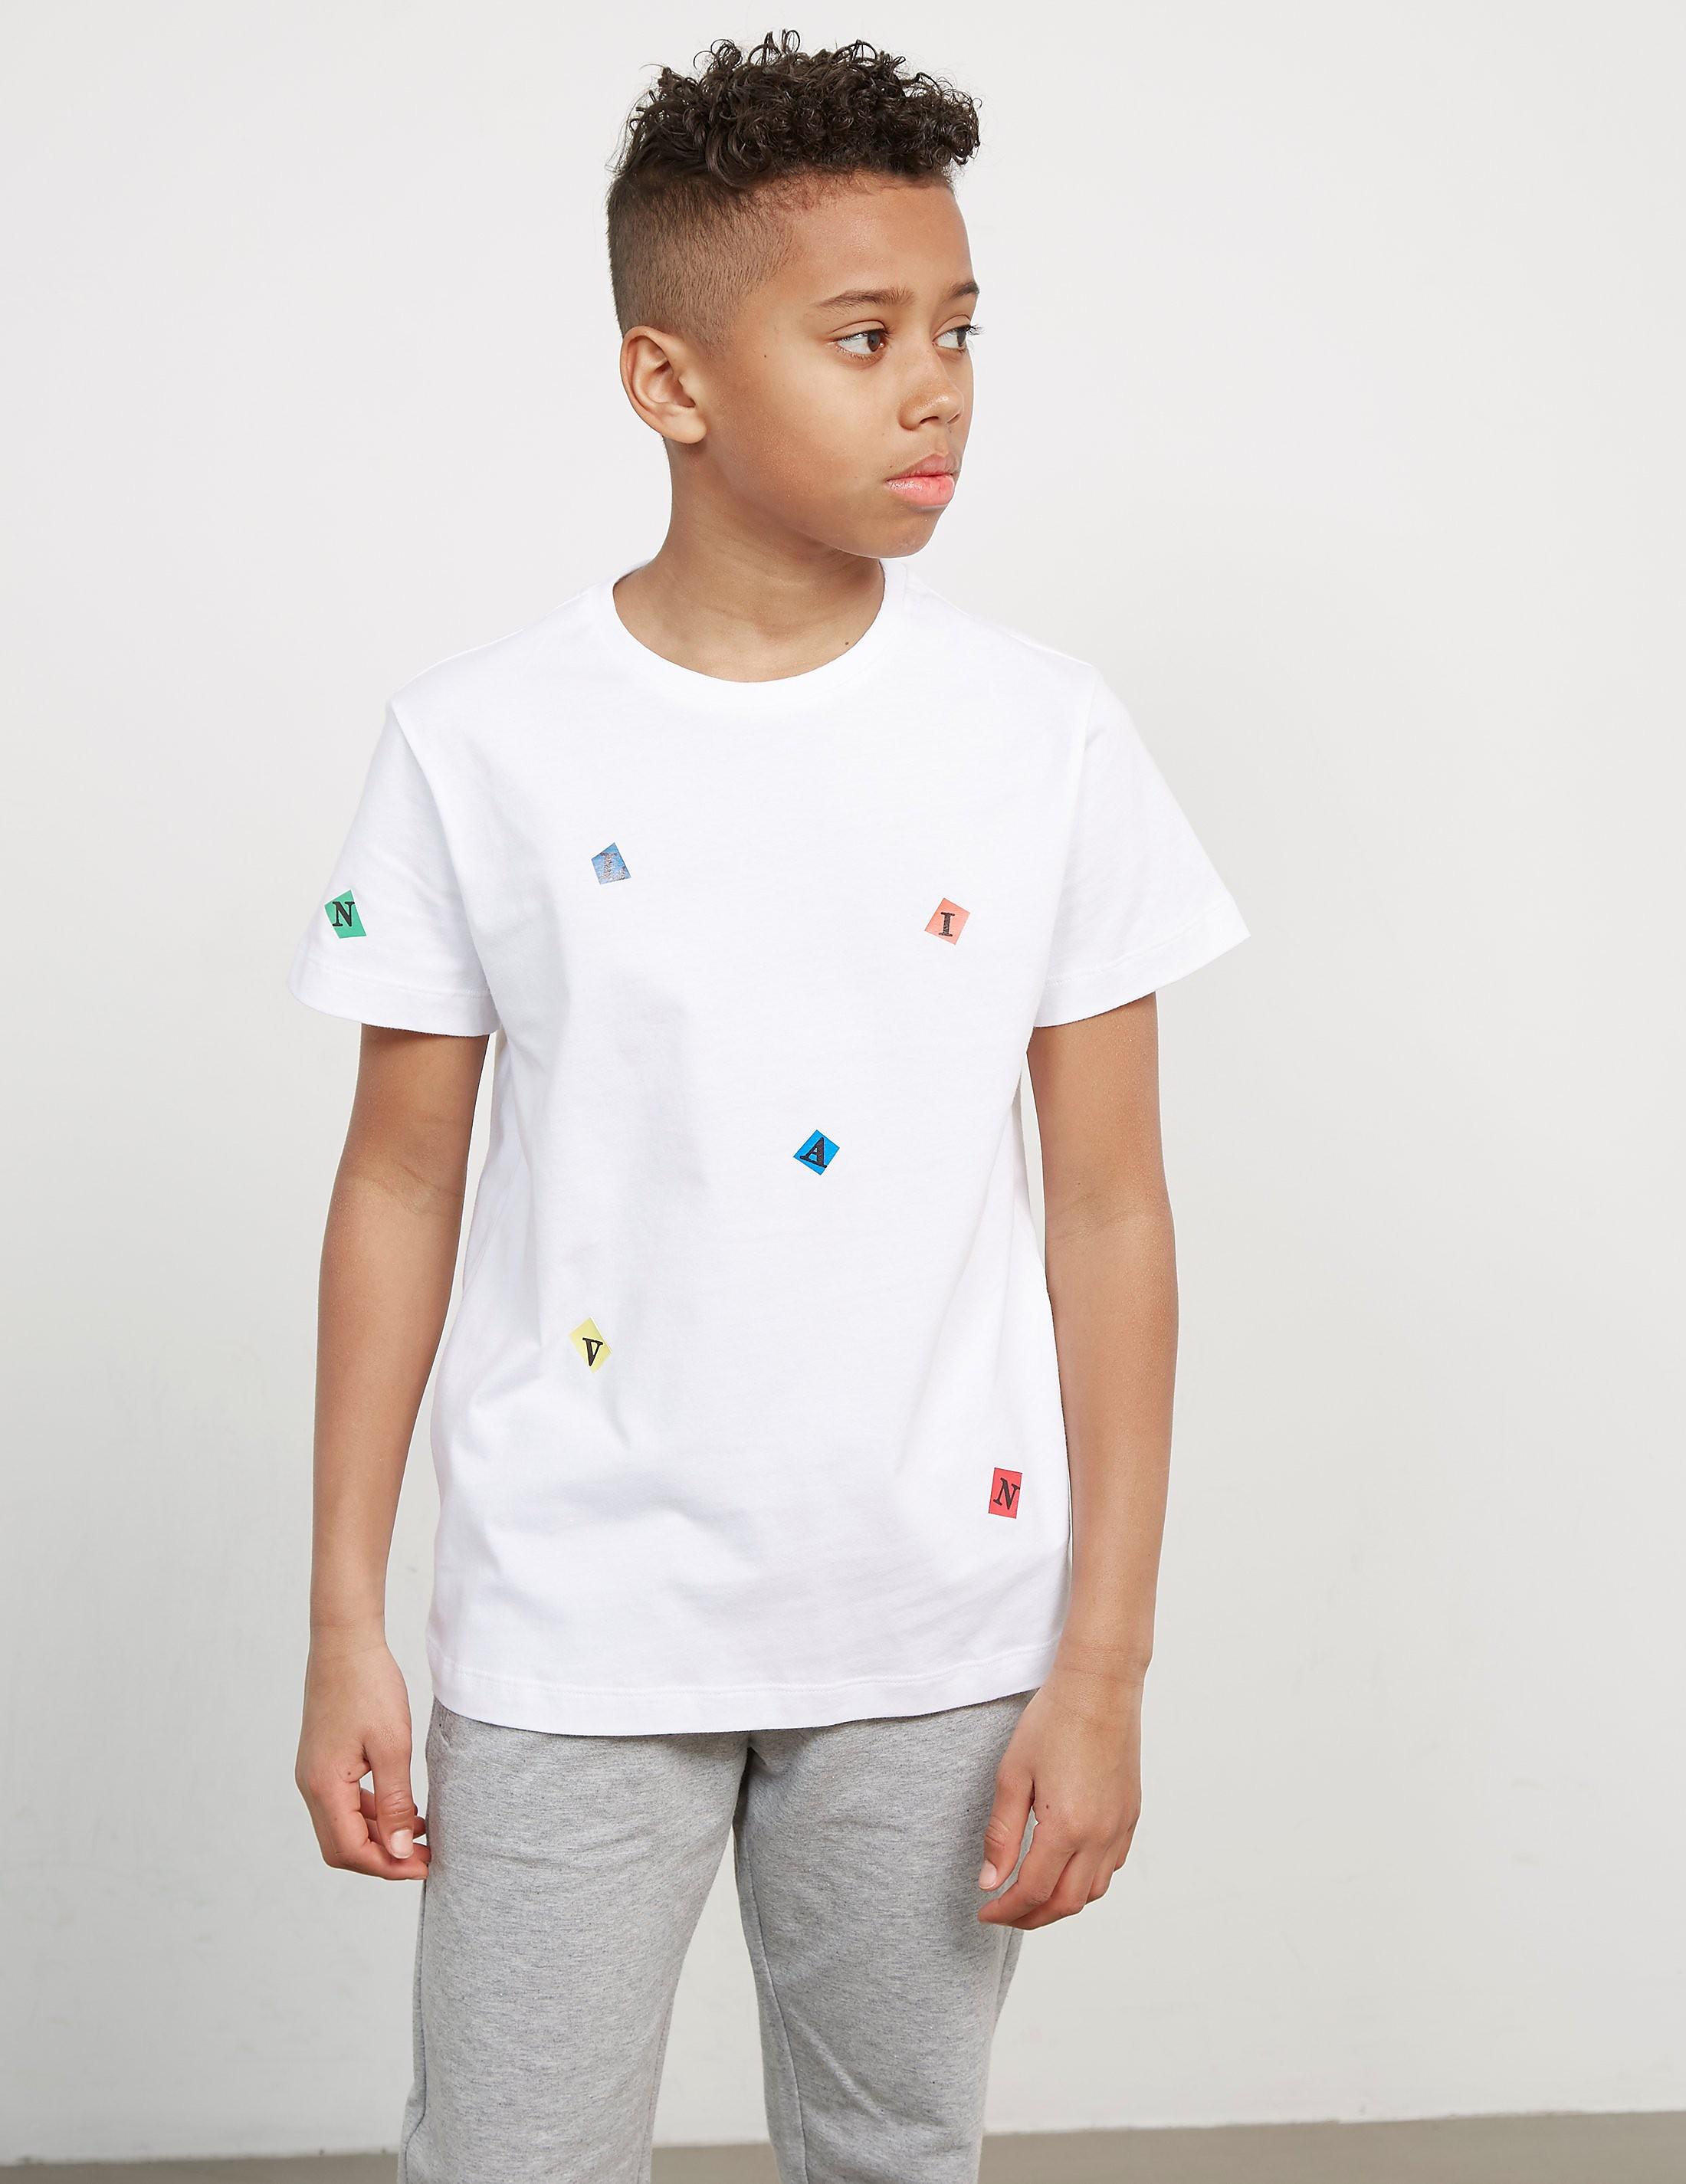 Lanvin Printed Short Sleeve T-Shirt